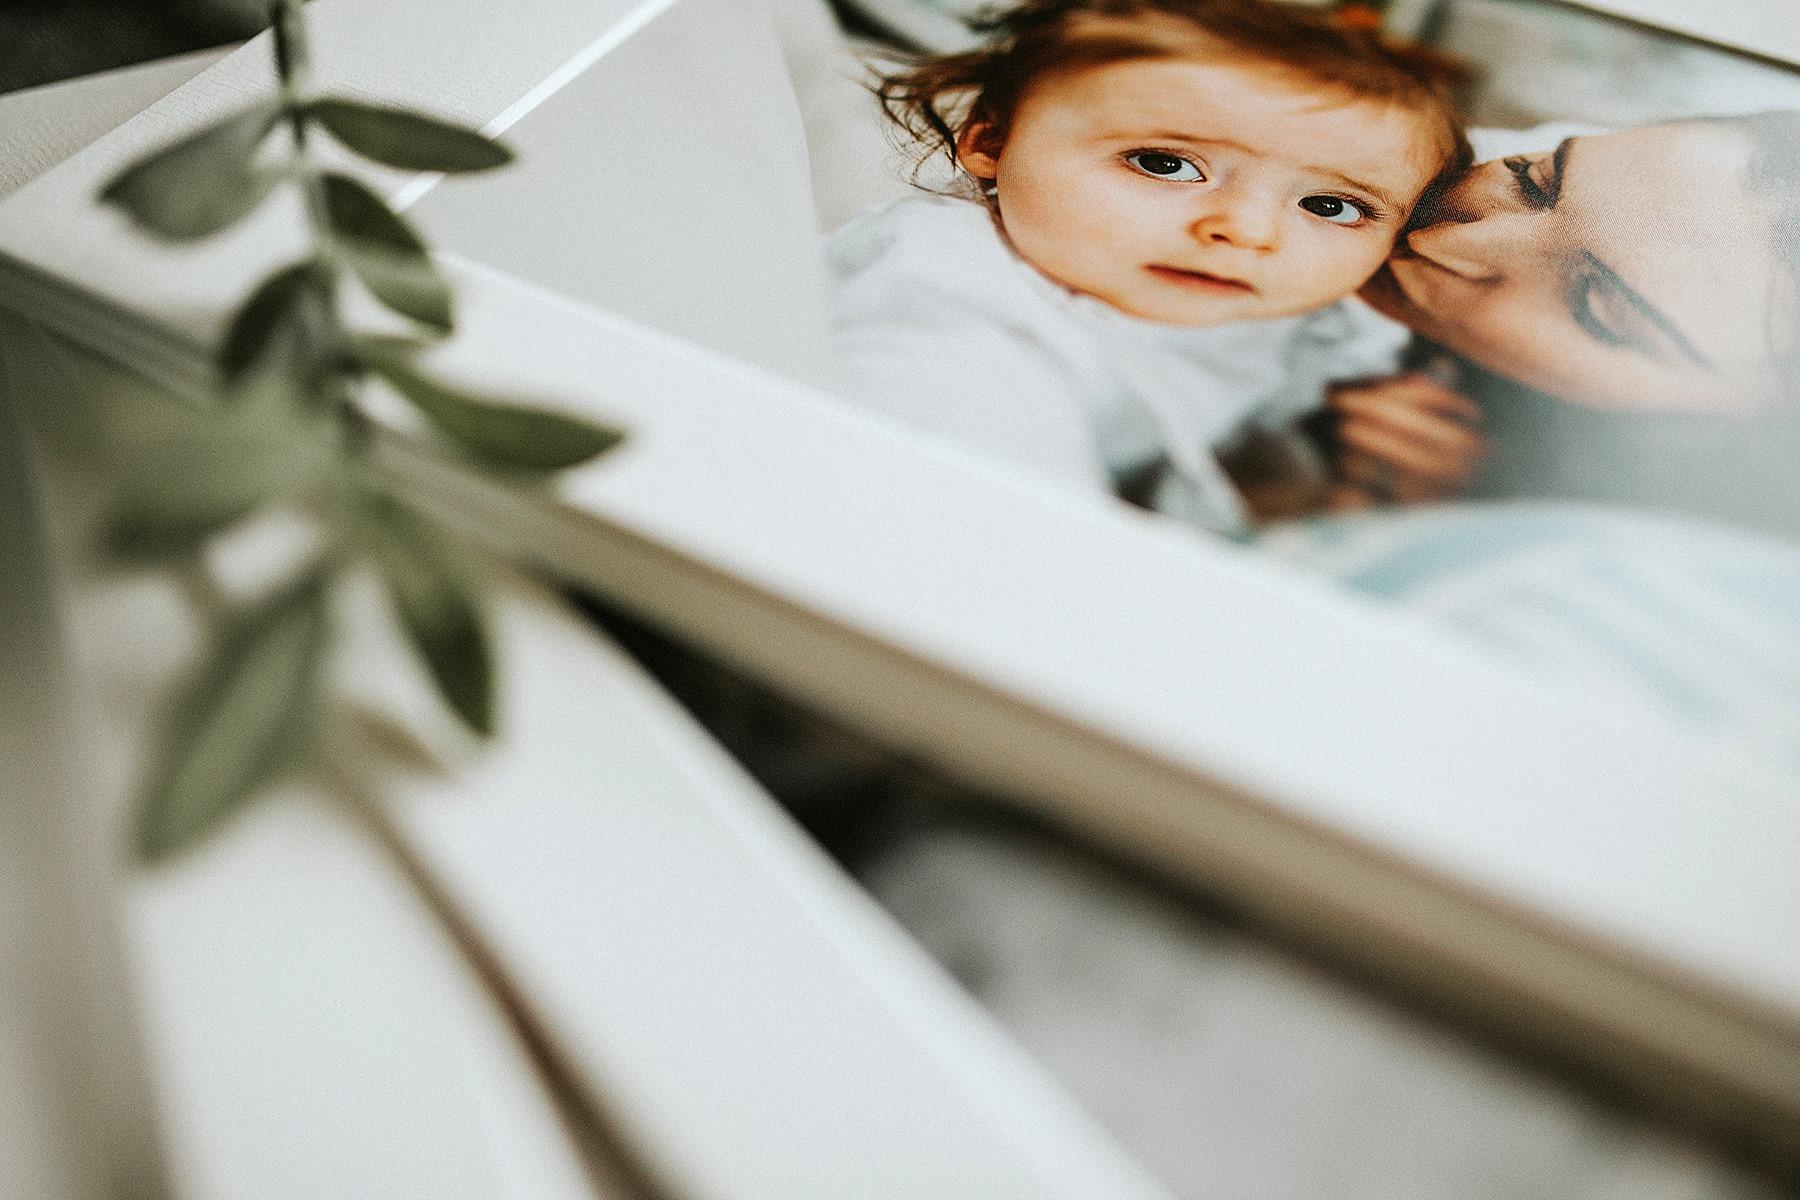 dublin-lifestyle-family-photography-prints-box-0001.jpg